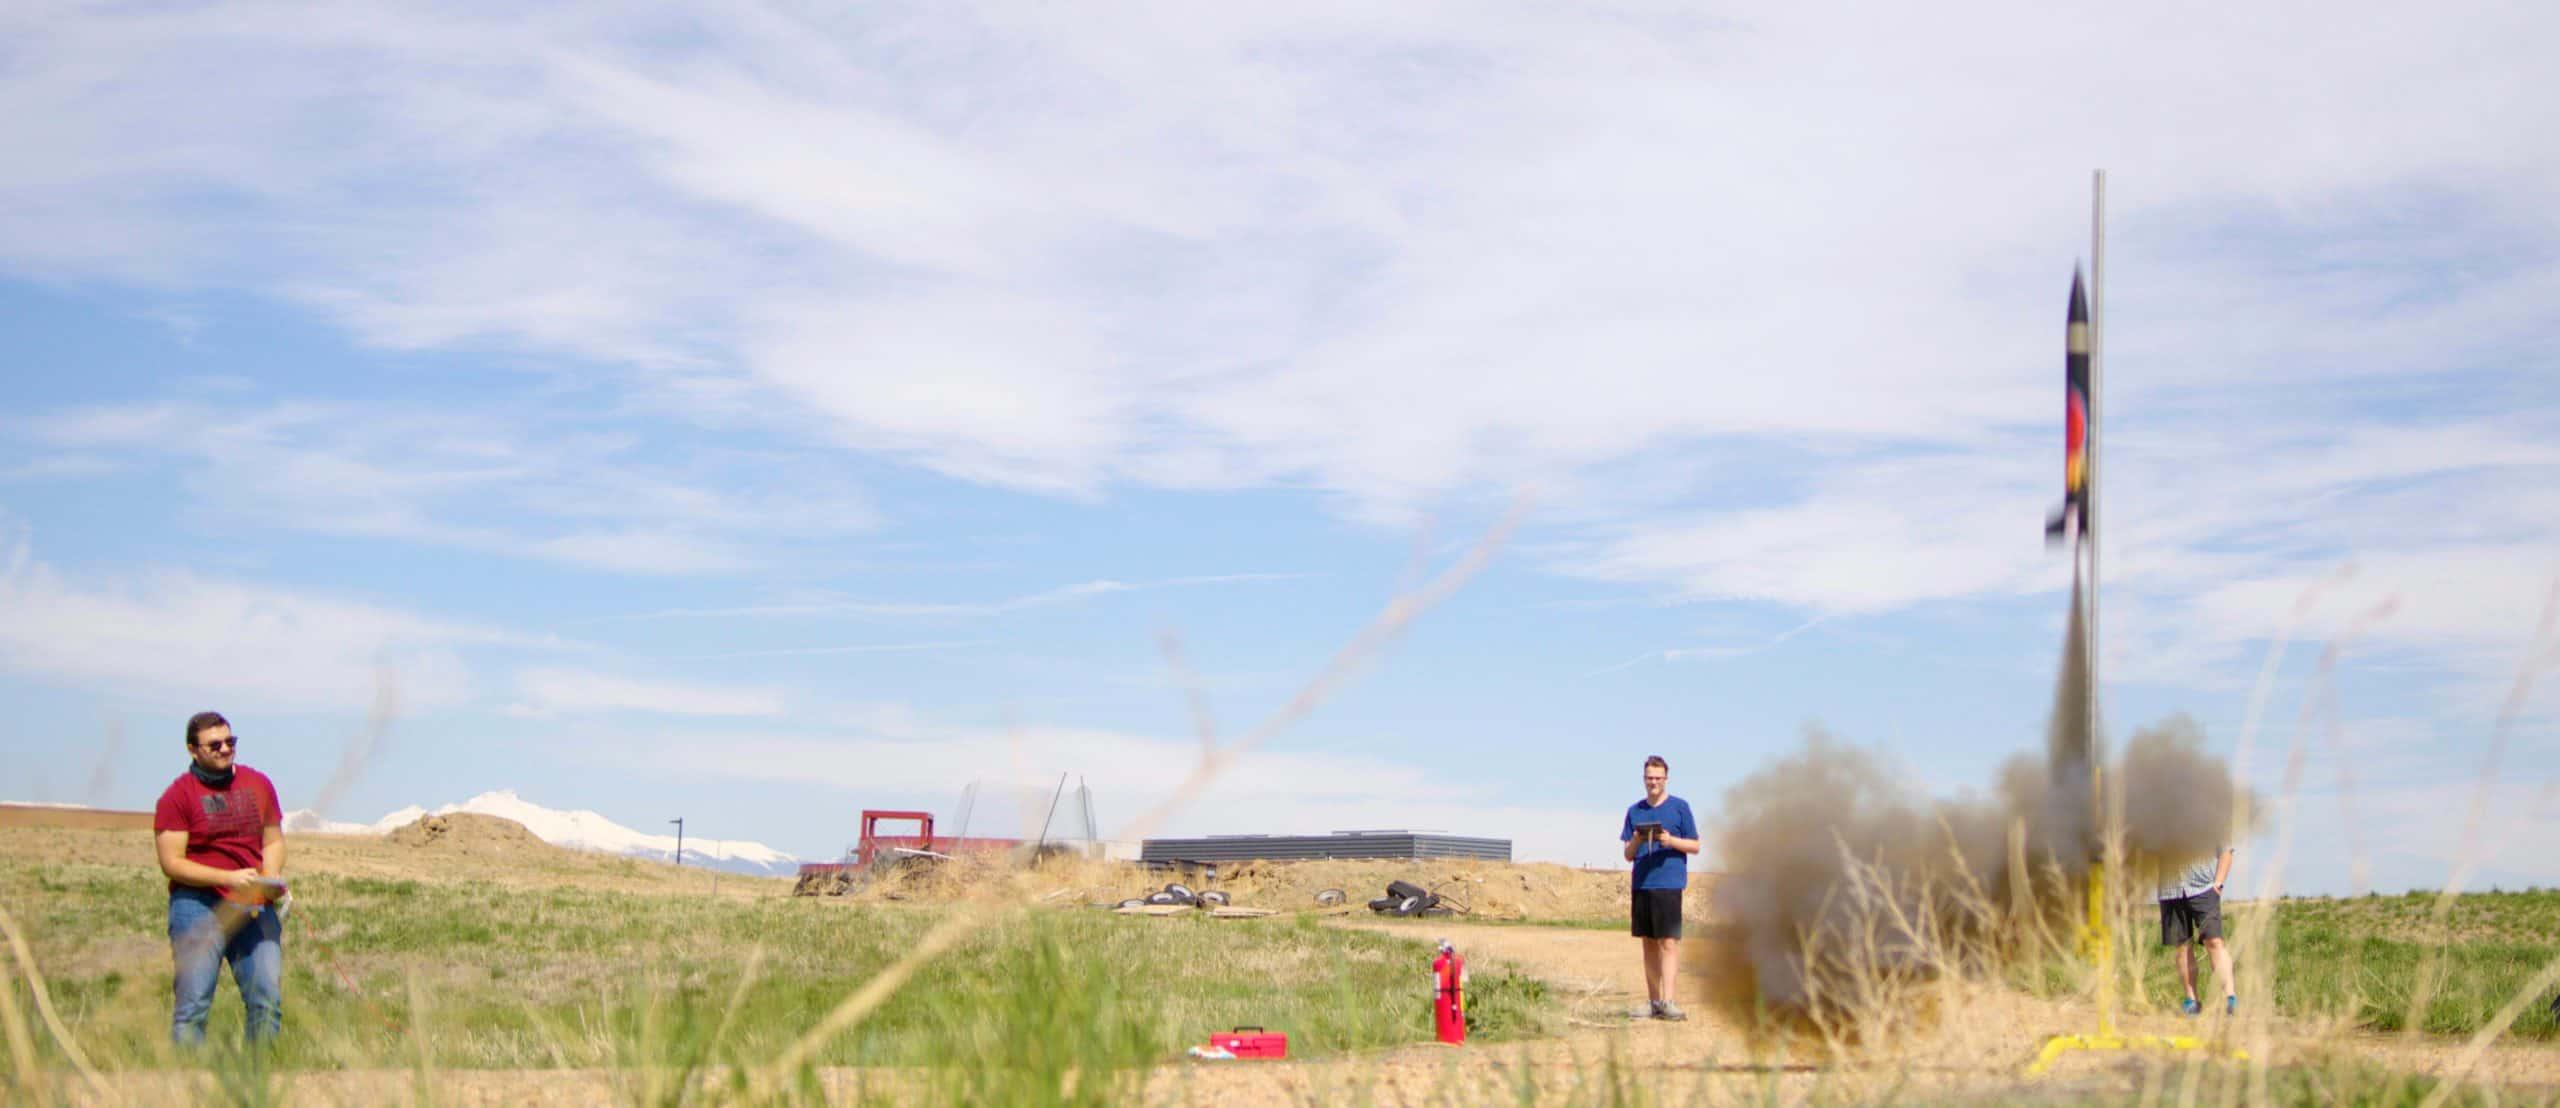 erie high school students launch a rocket in a field